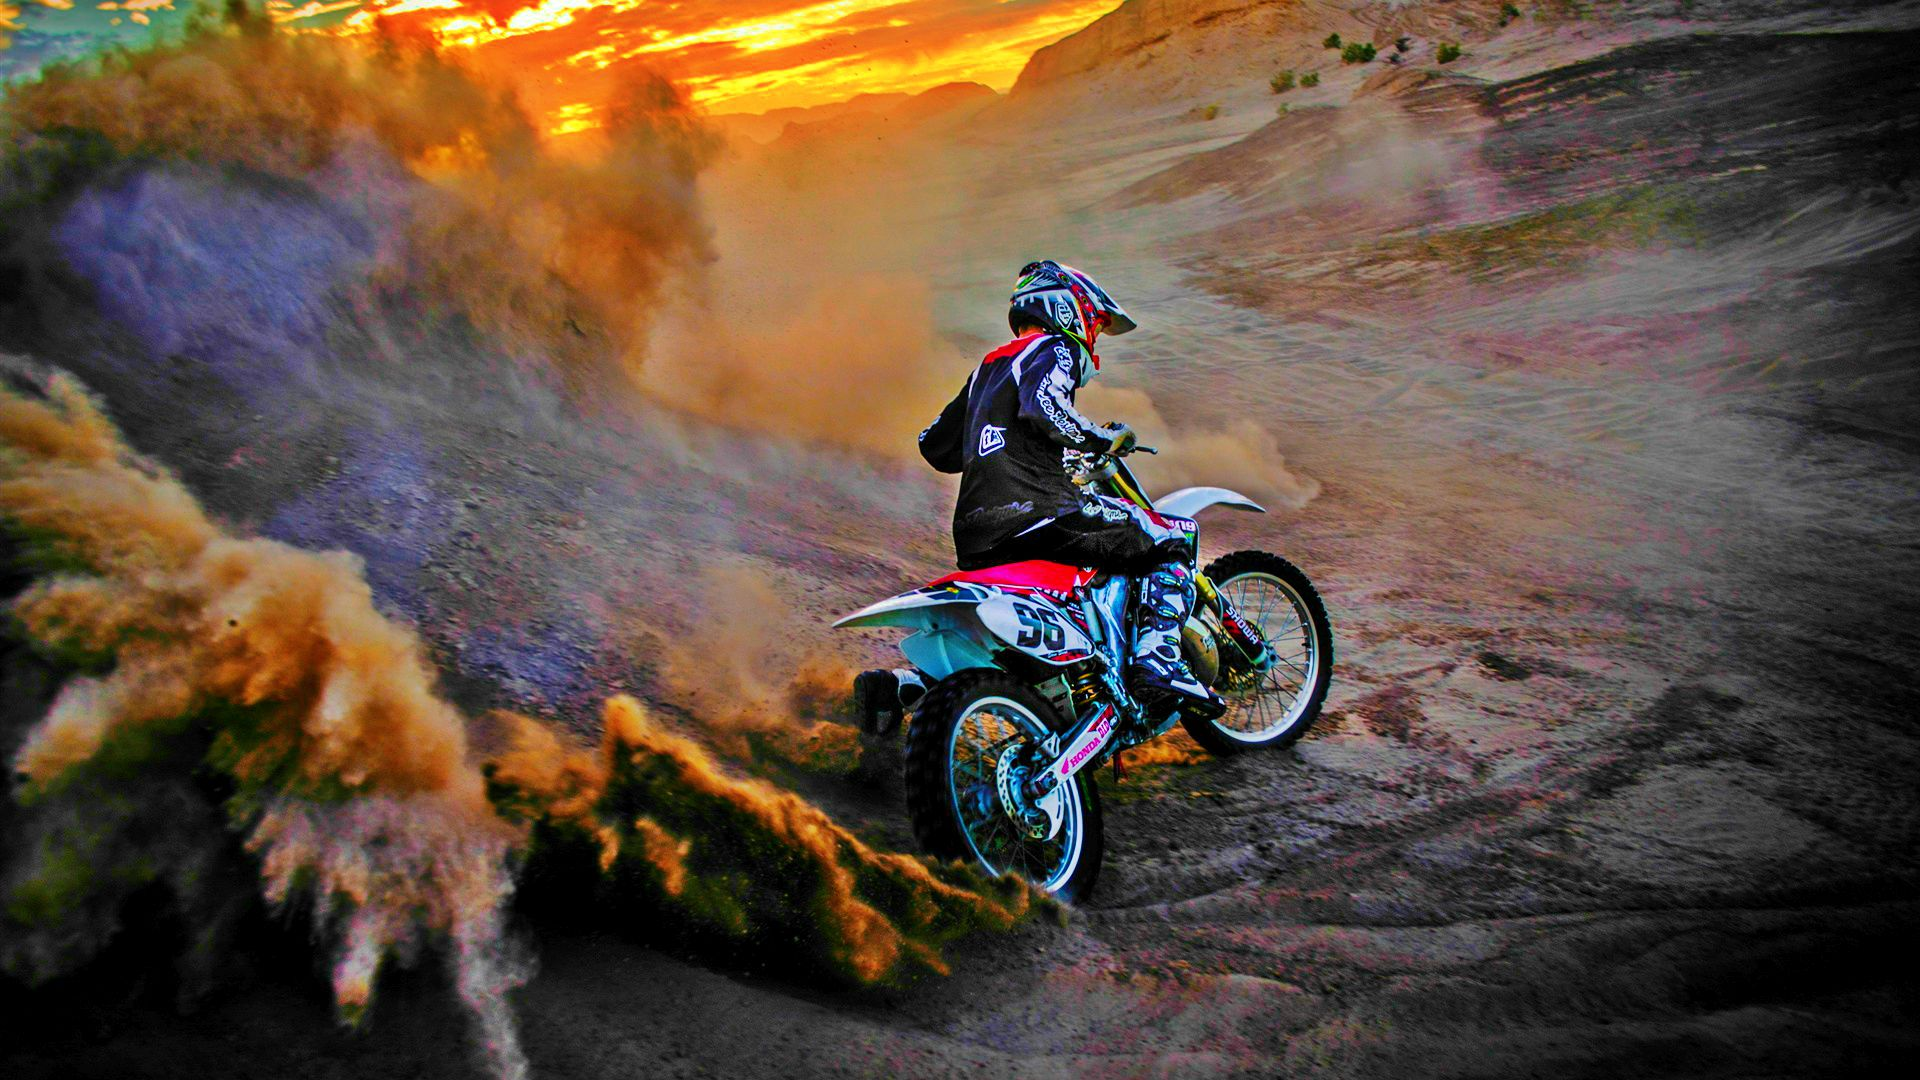 BuzzTrakr Freestyle Motocross Extreme 1920x1080